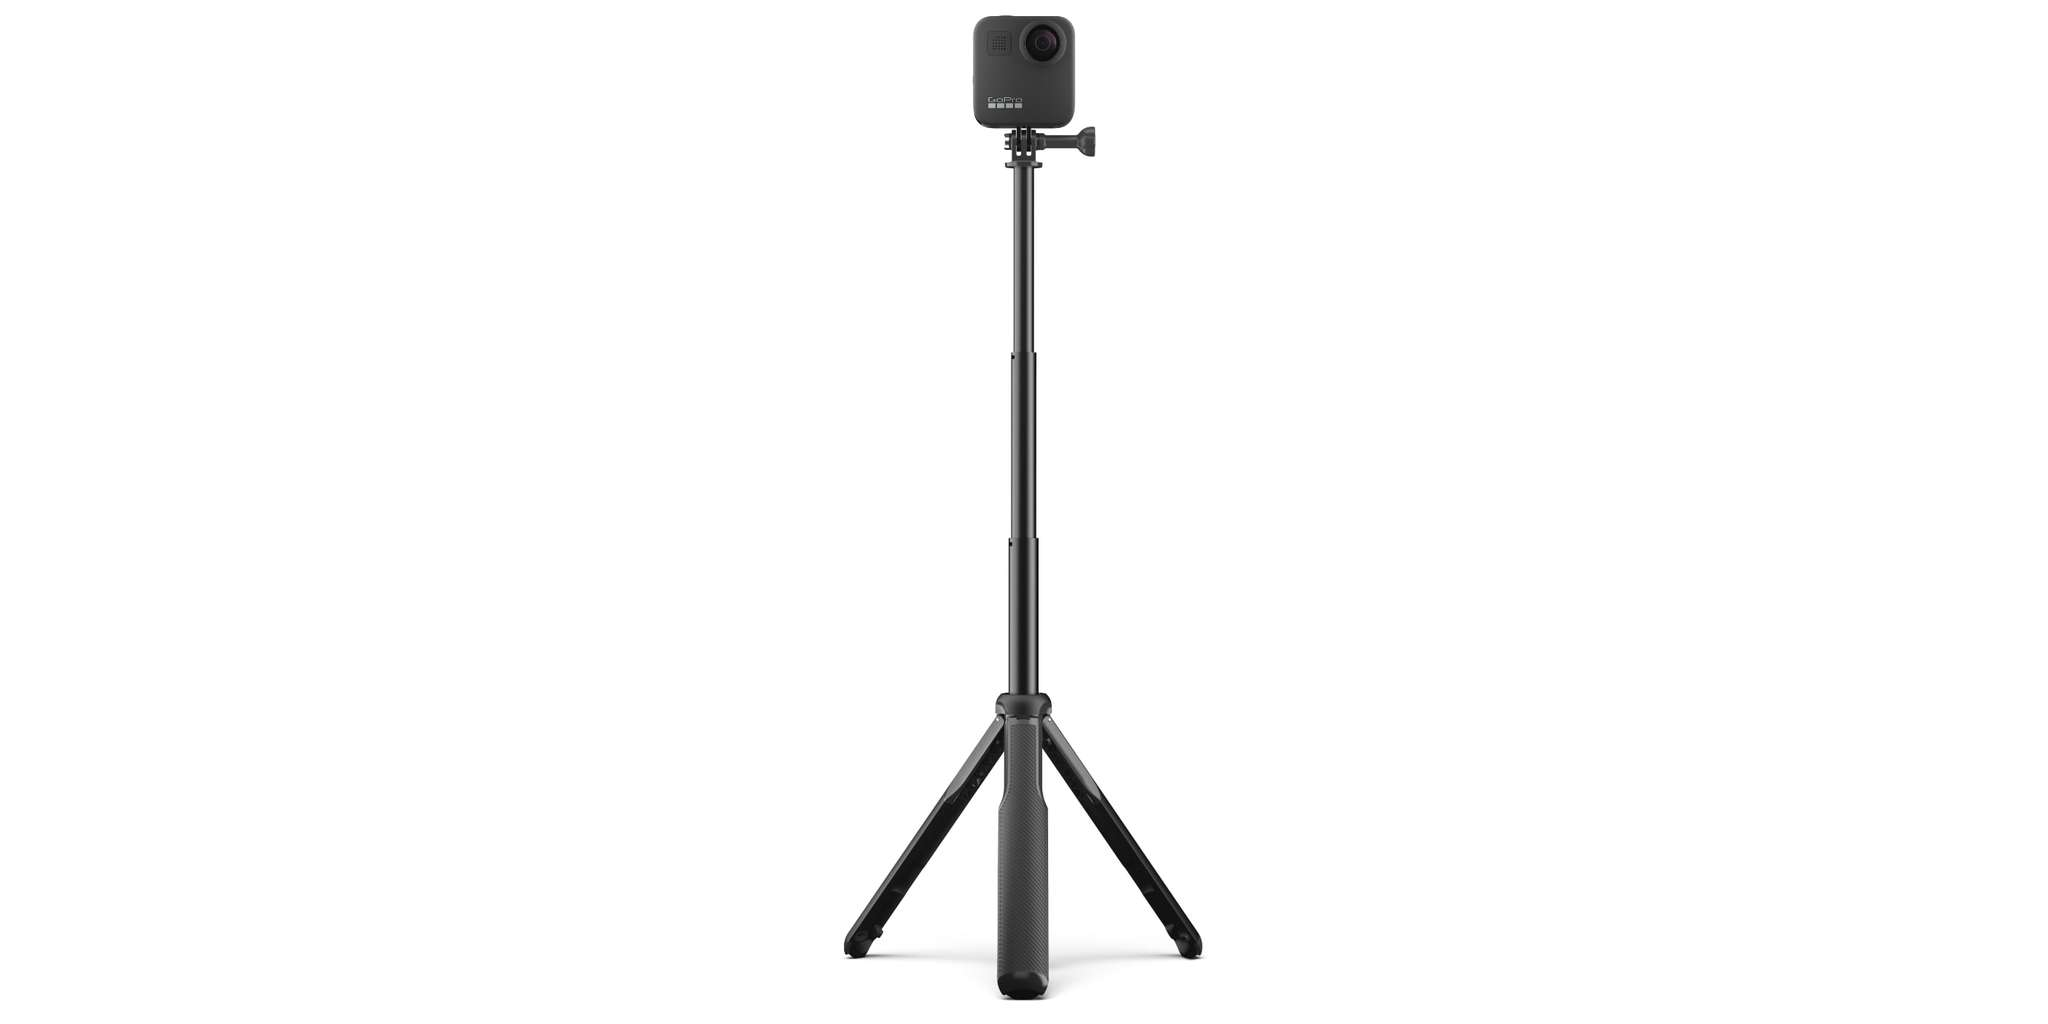 Телескопический монопод-штатив GoPro MAX Grip Tripod (ASBHM-002)